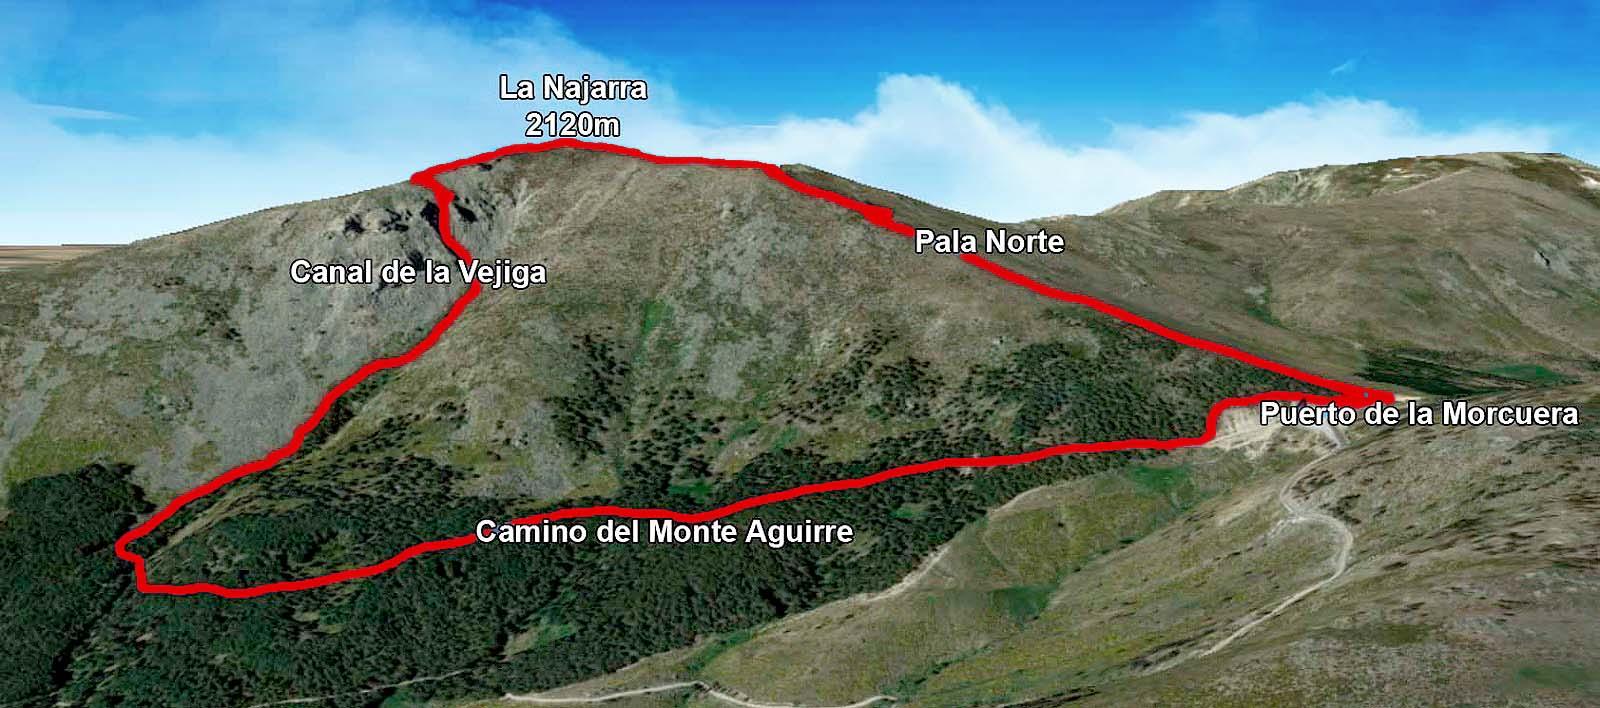 Ruta La Najarra en Sierra de Guadarrama